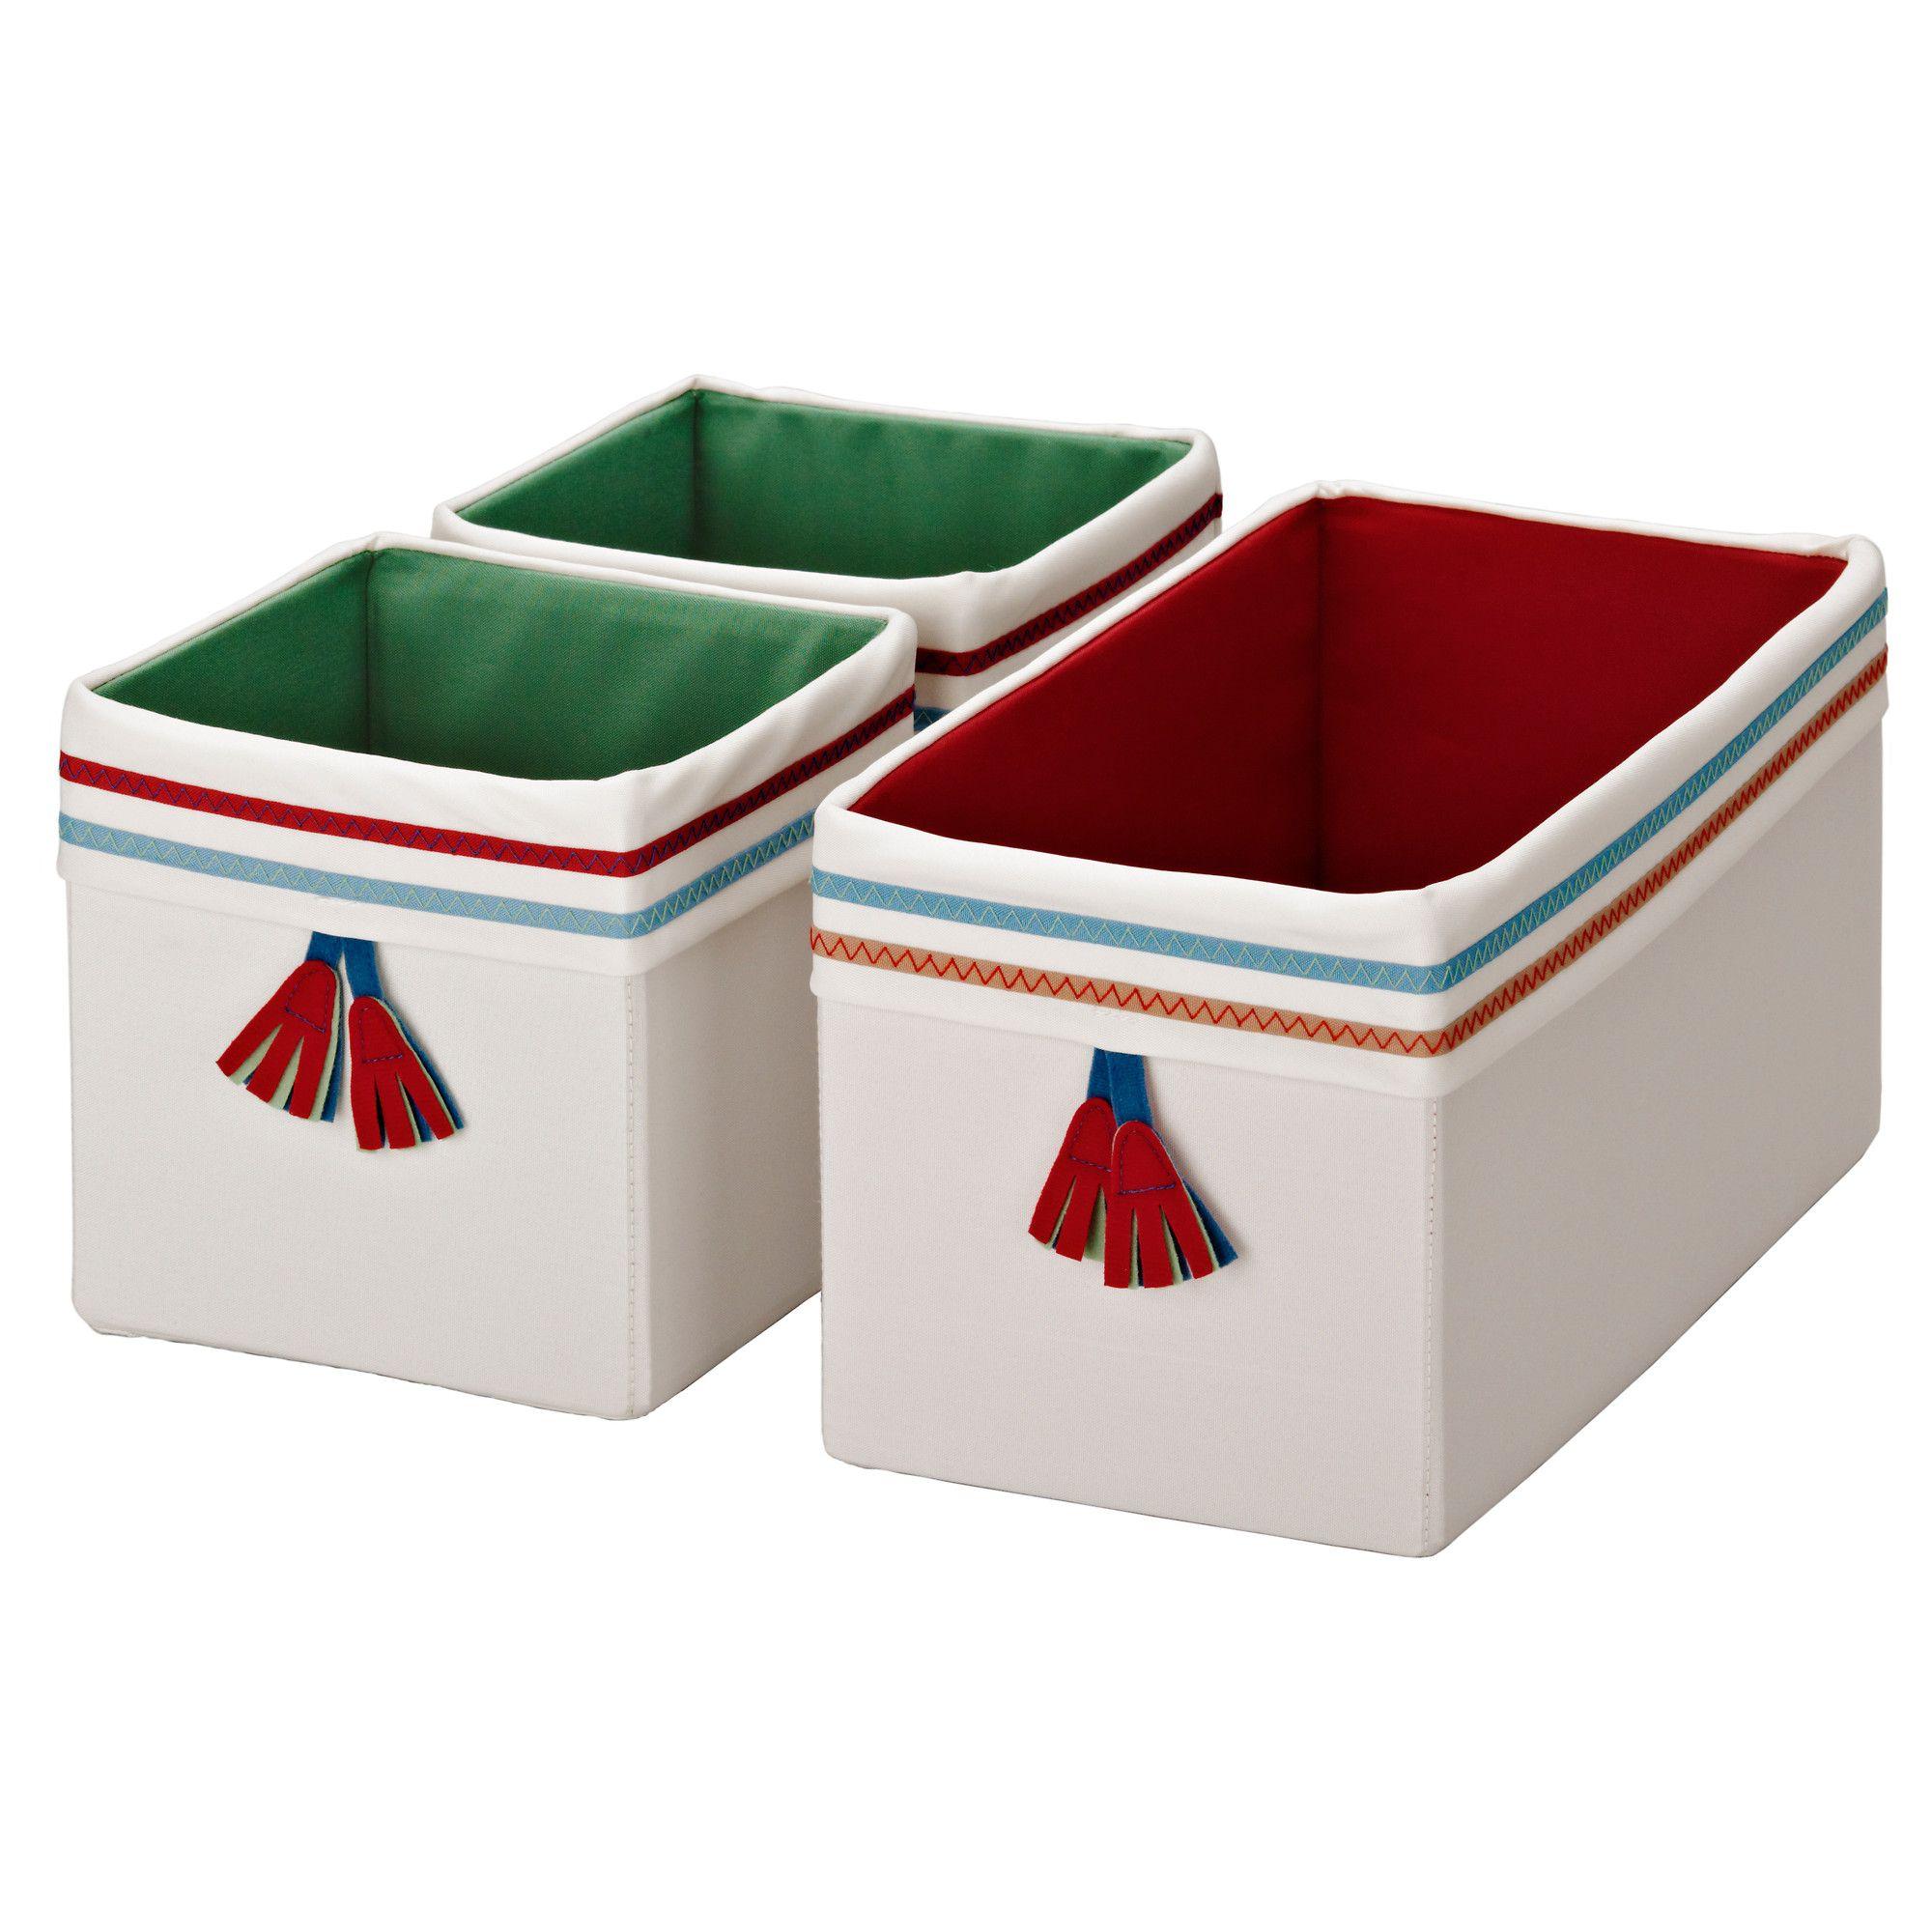 pysslingar box ikea great option for changing table. Black Bedroom Furniture Sets. Home Design Ideas